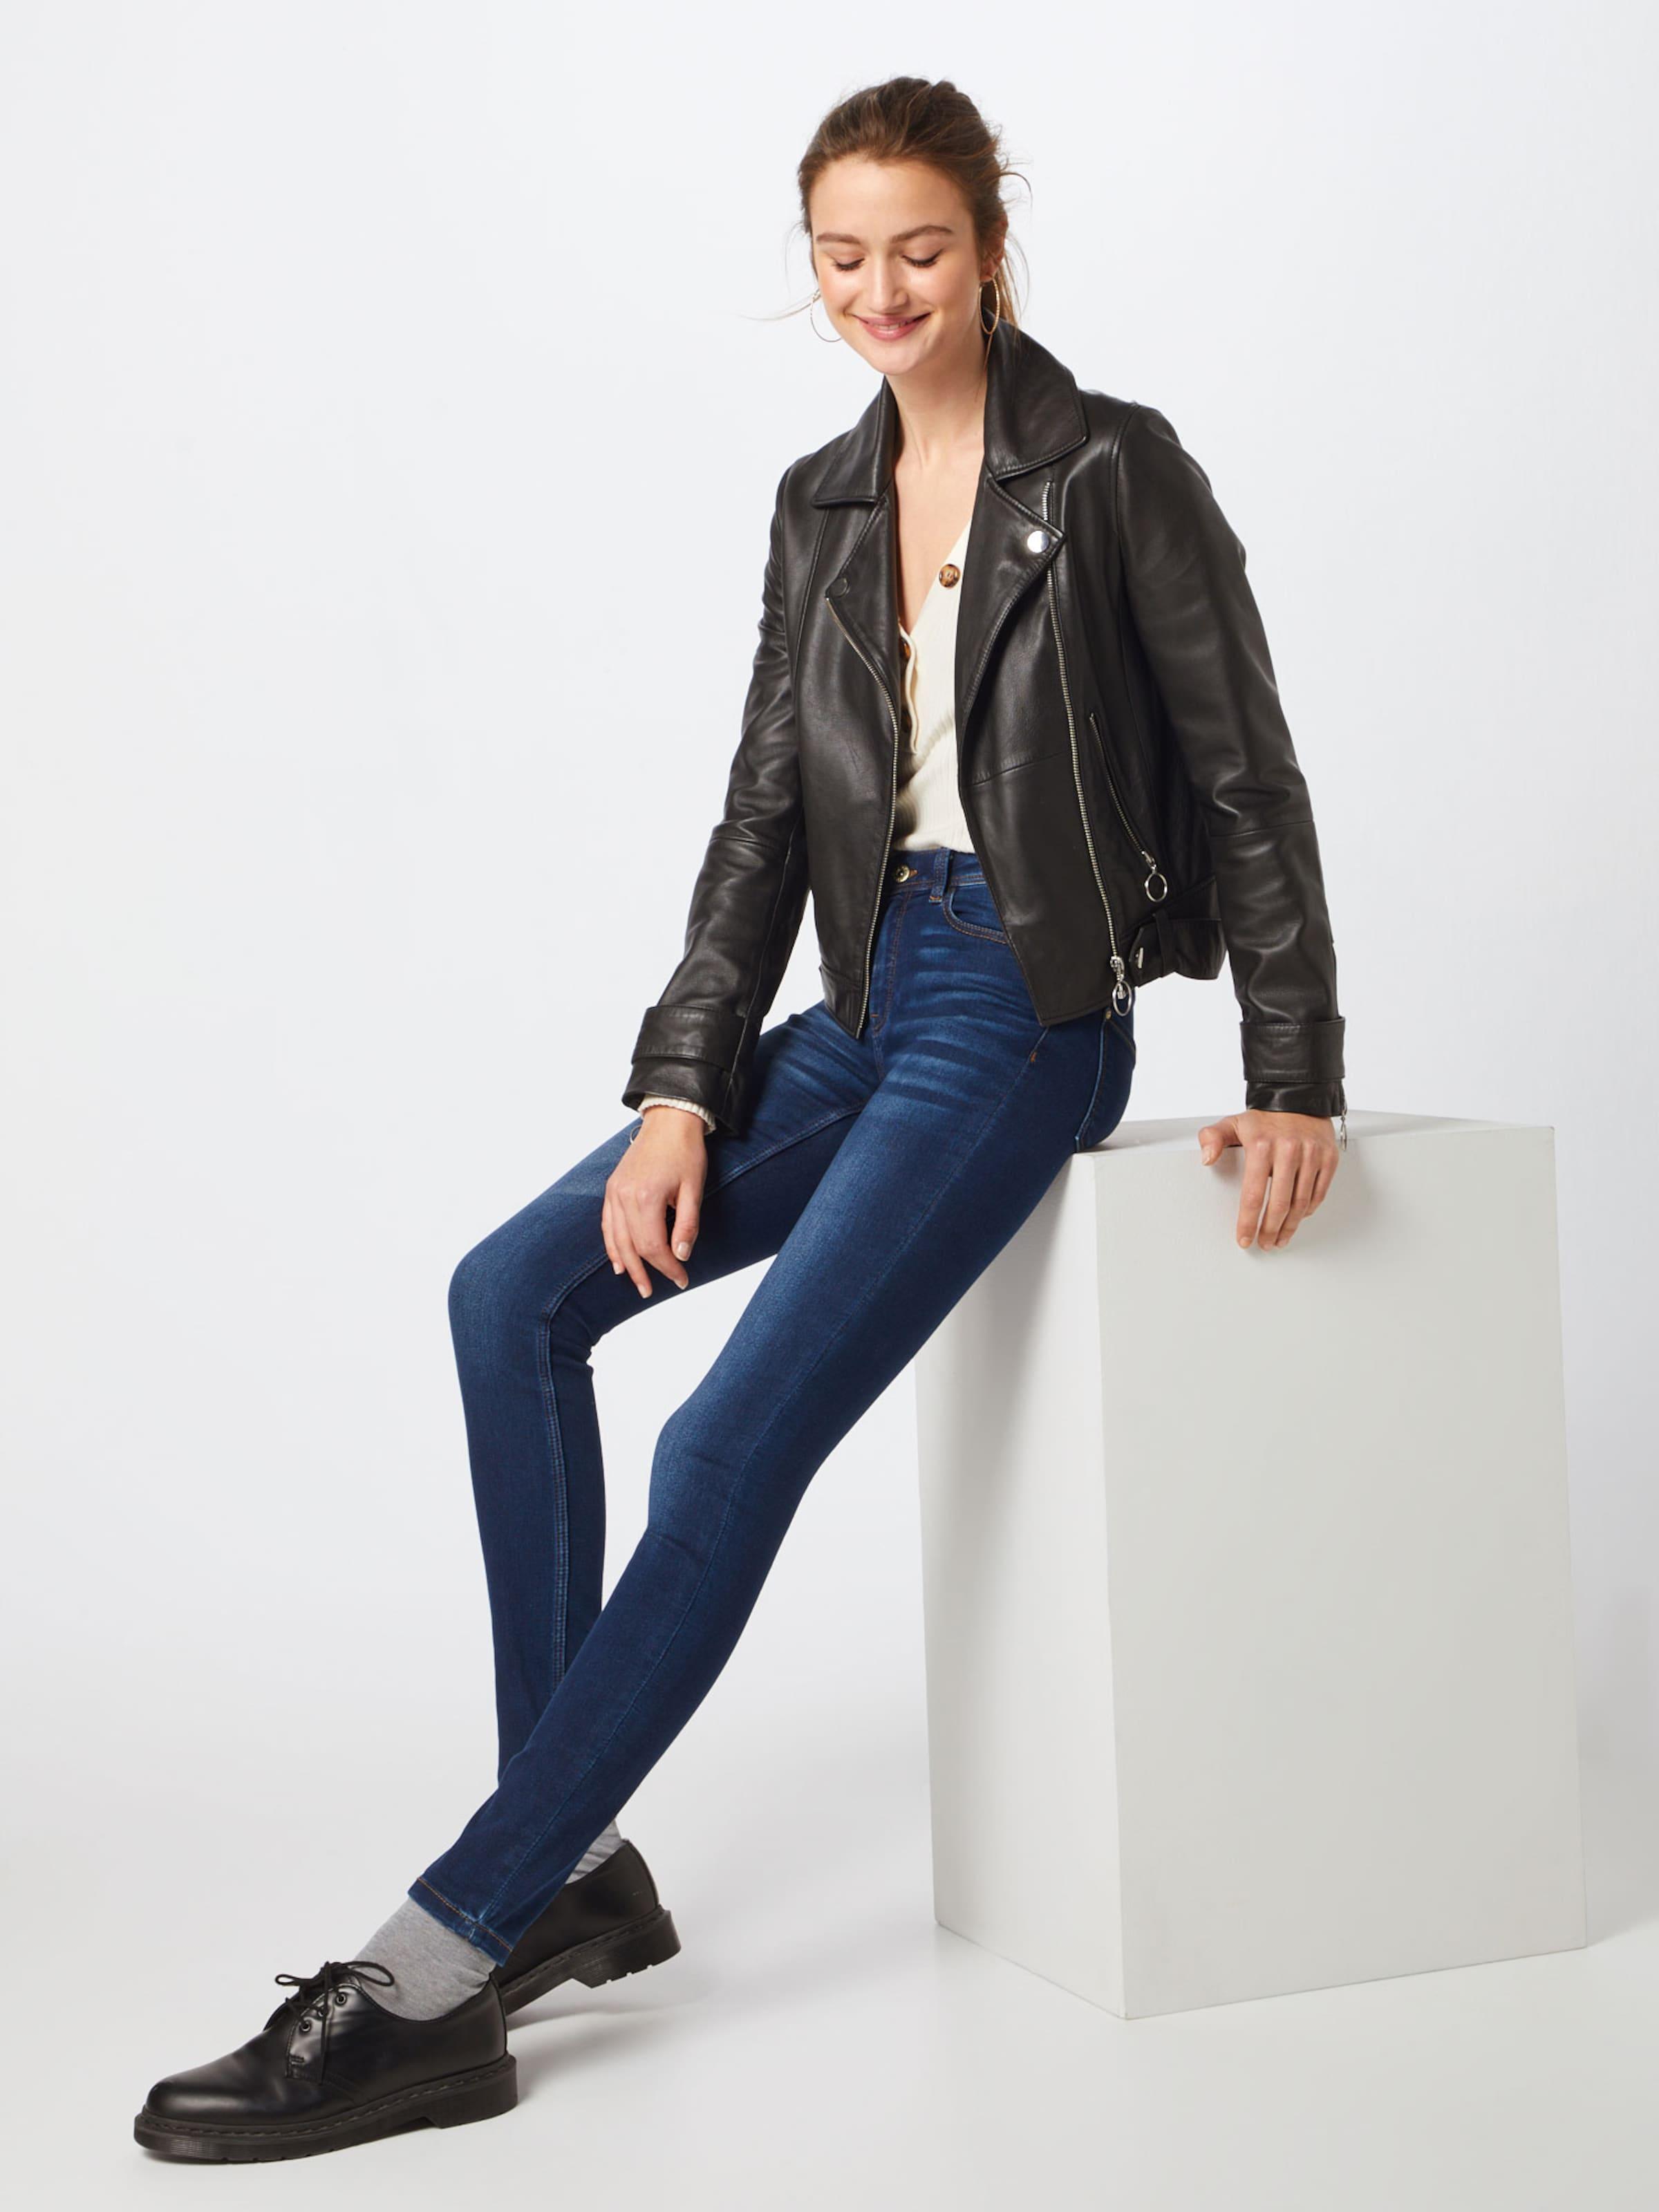 Jacqueline Rw Dark Foncé Jean Yong Bleu 'jdyganny En De Skinny Blue' vY7byf6g